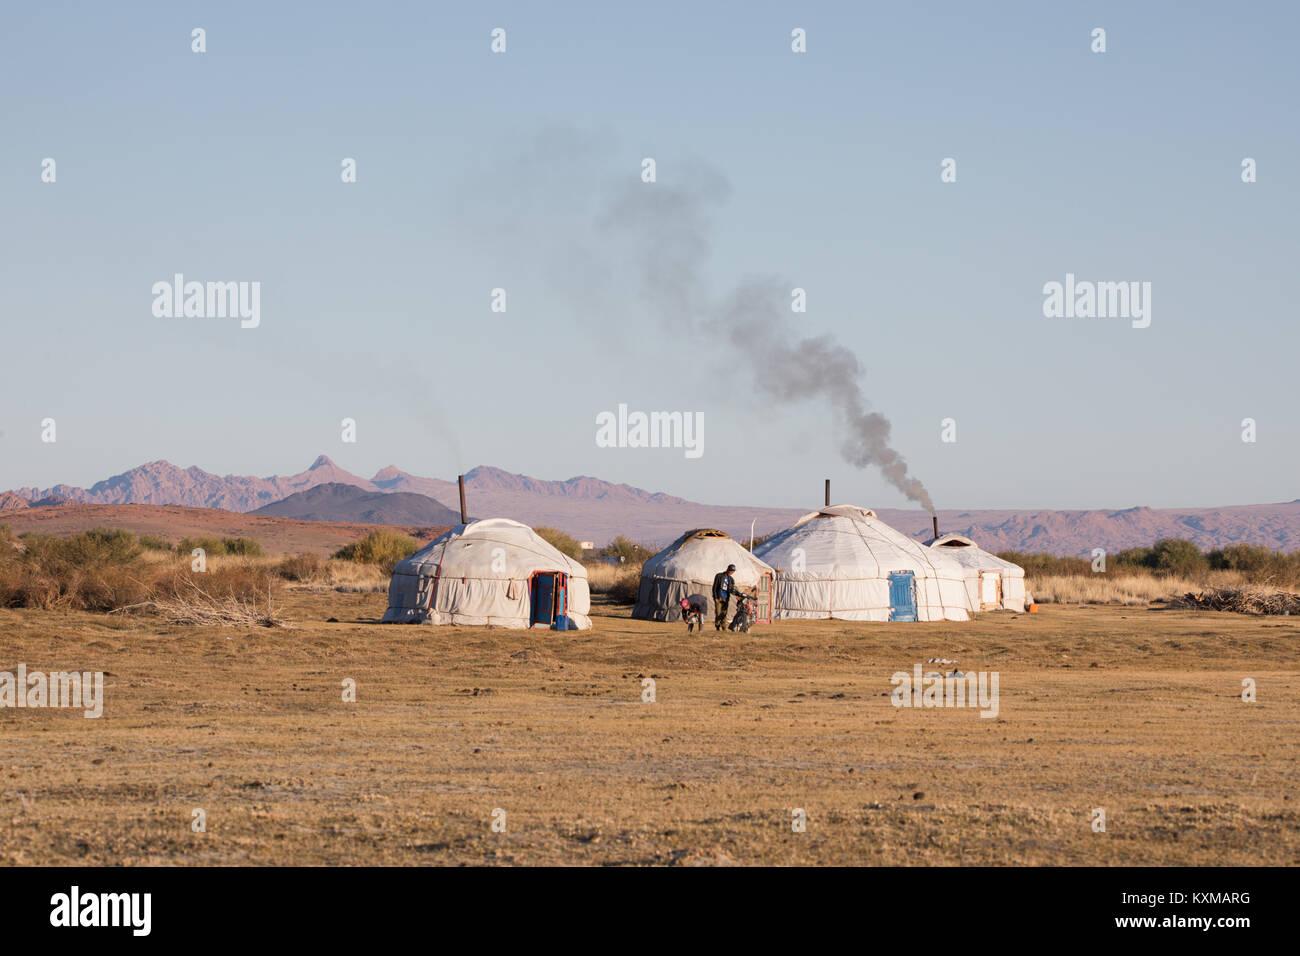 Gers Mongoles humo chimenea tradicional familia comunidad rural país vida lateral Foto de stock